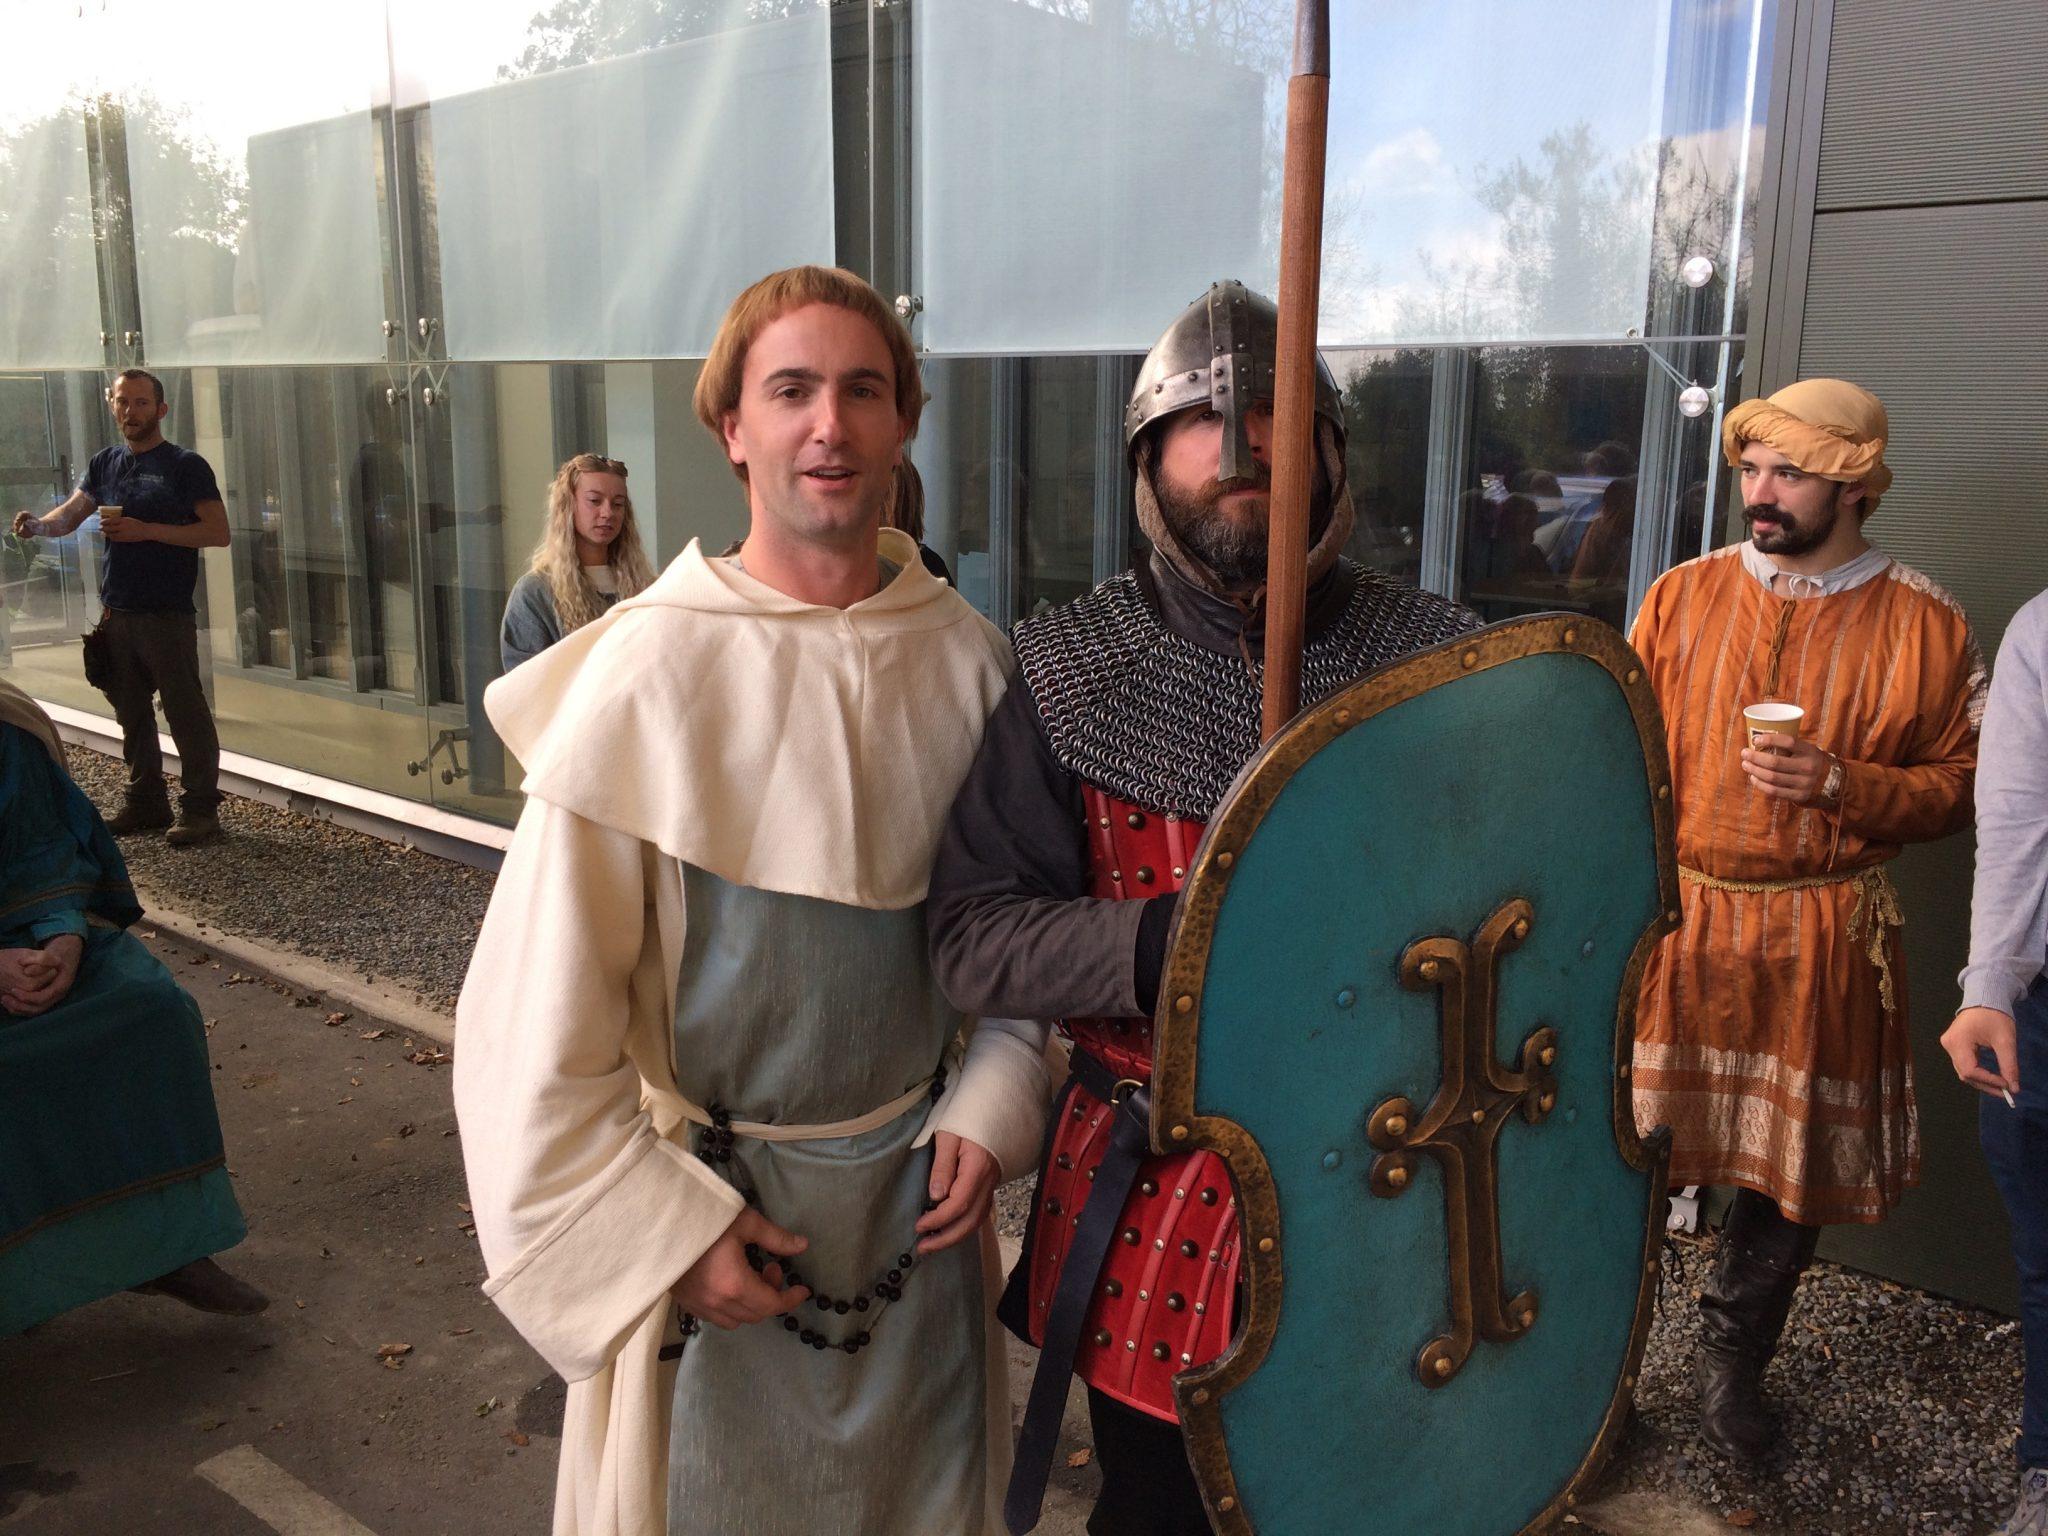 Vikings Ireland Crux chant monks